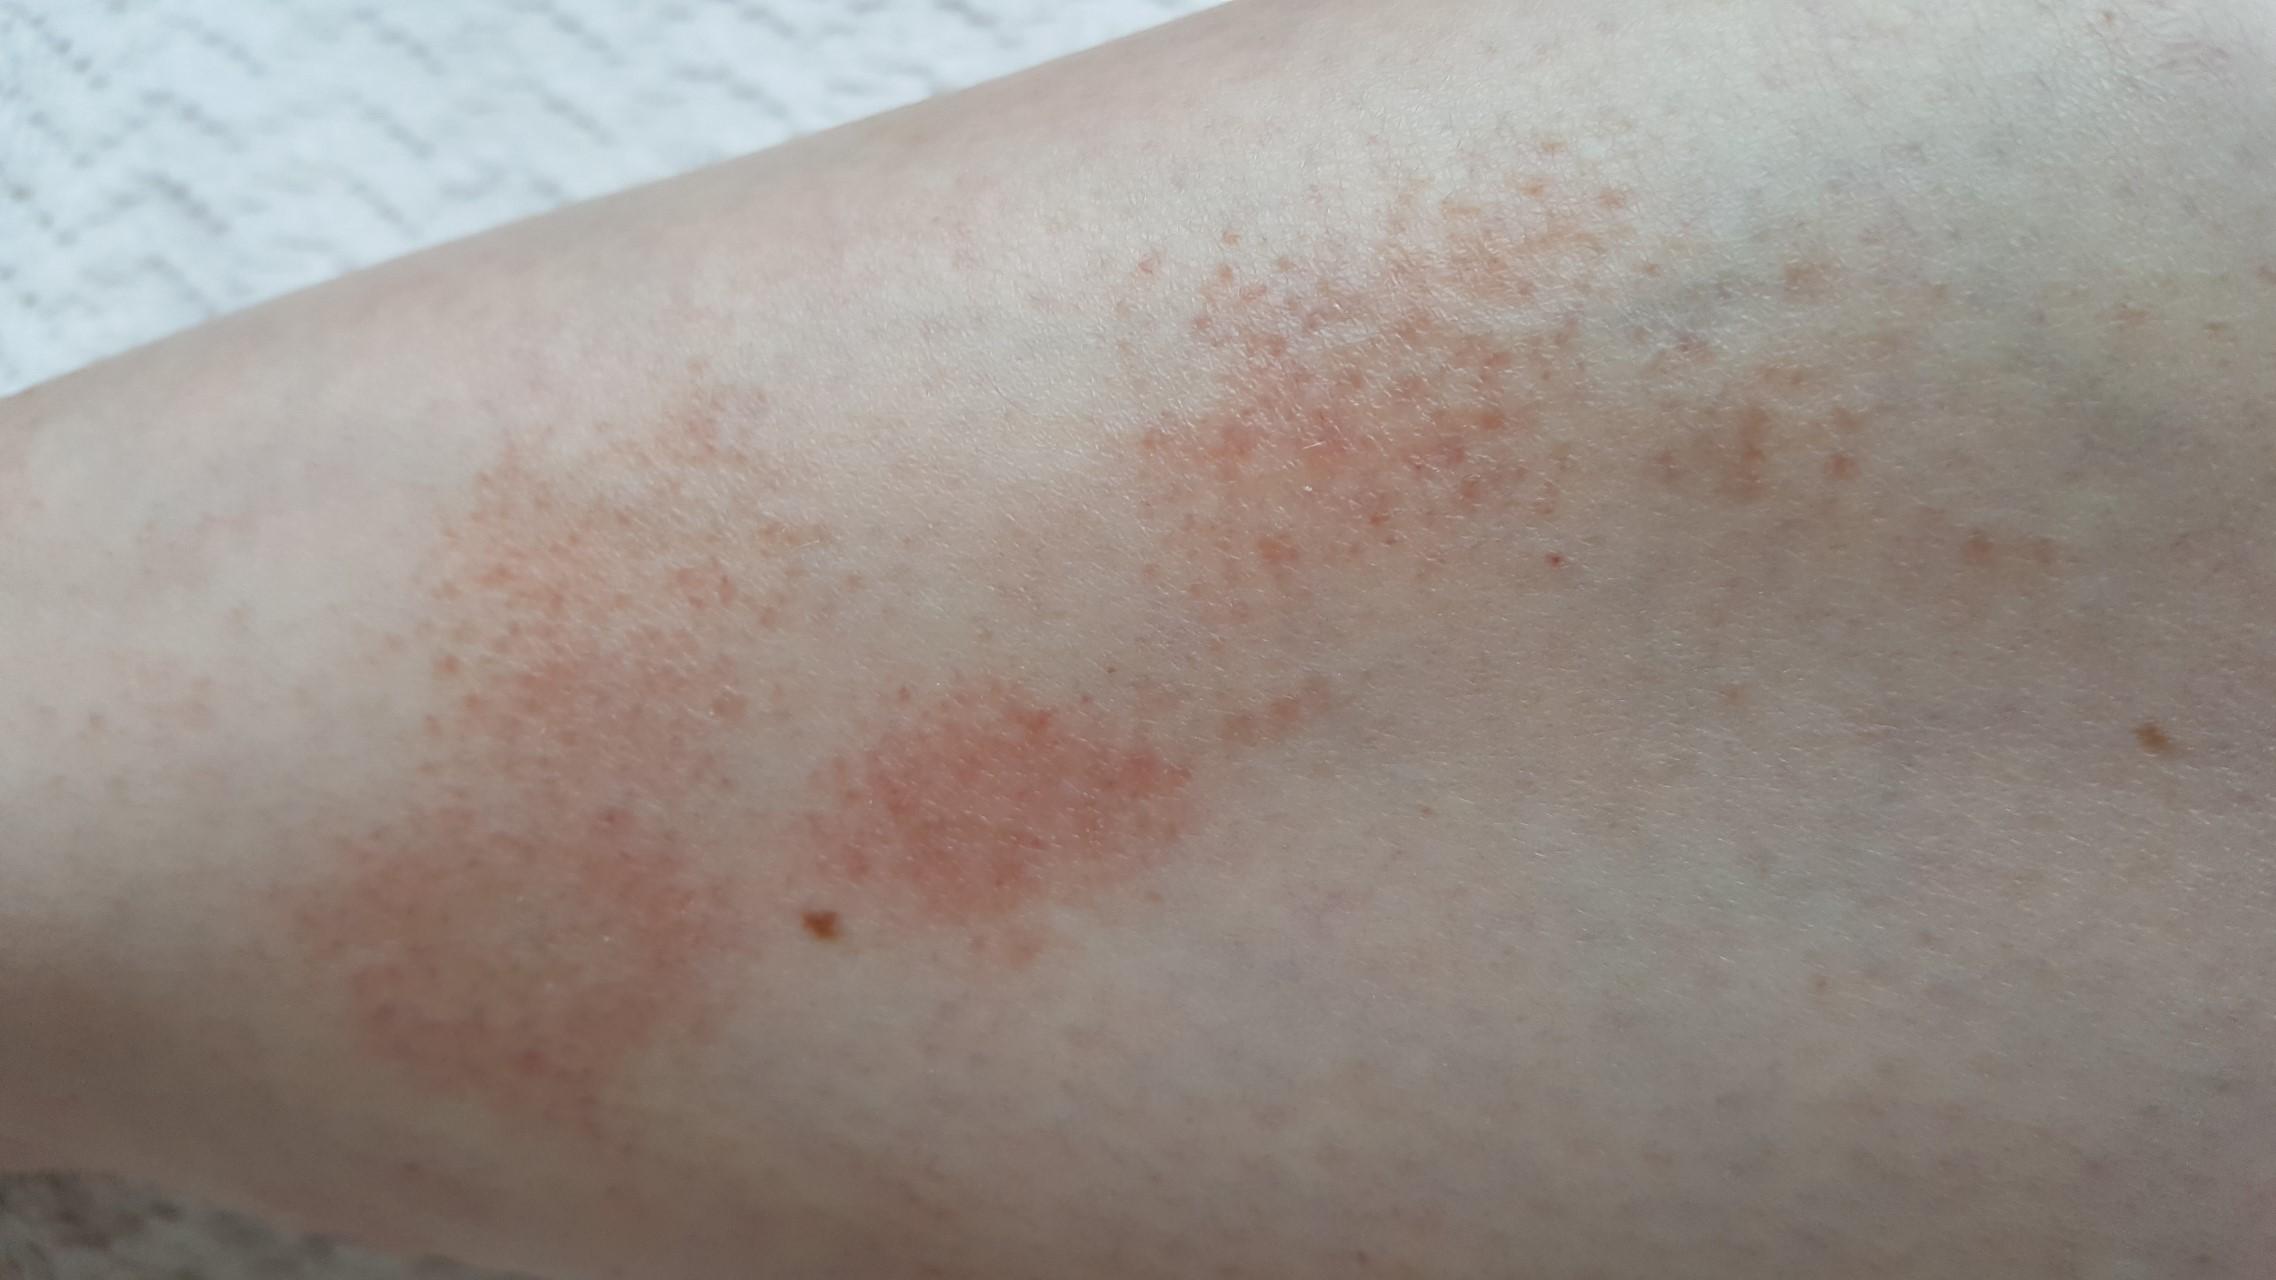 Красная сыпь на коже не чешется